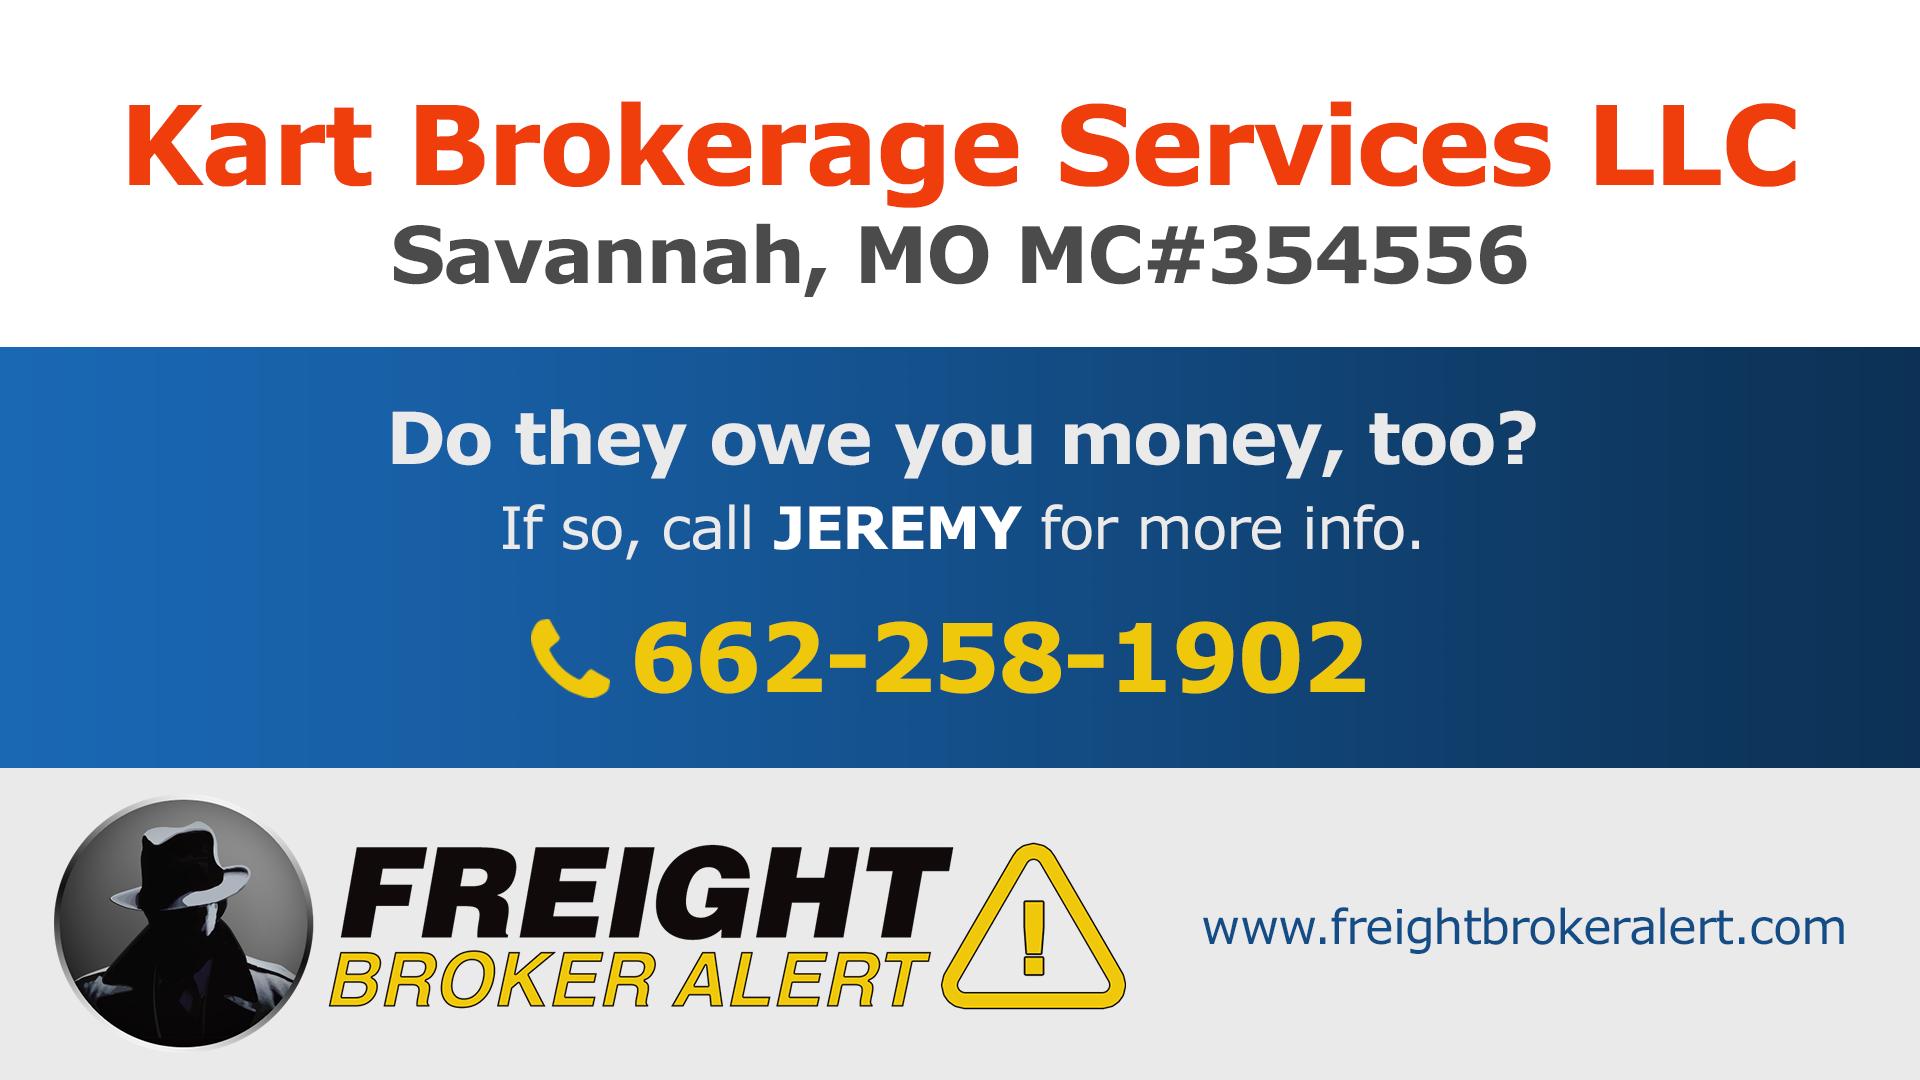 Kart Brokerage Services LLC | Freight Broker Alert